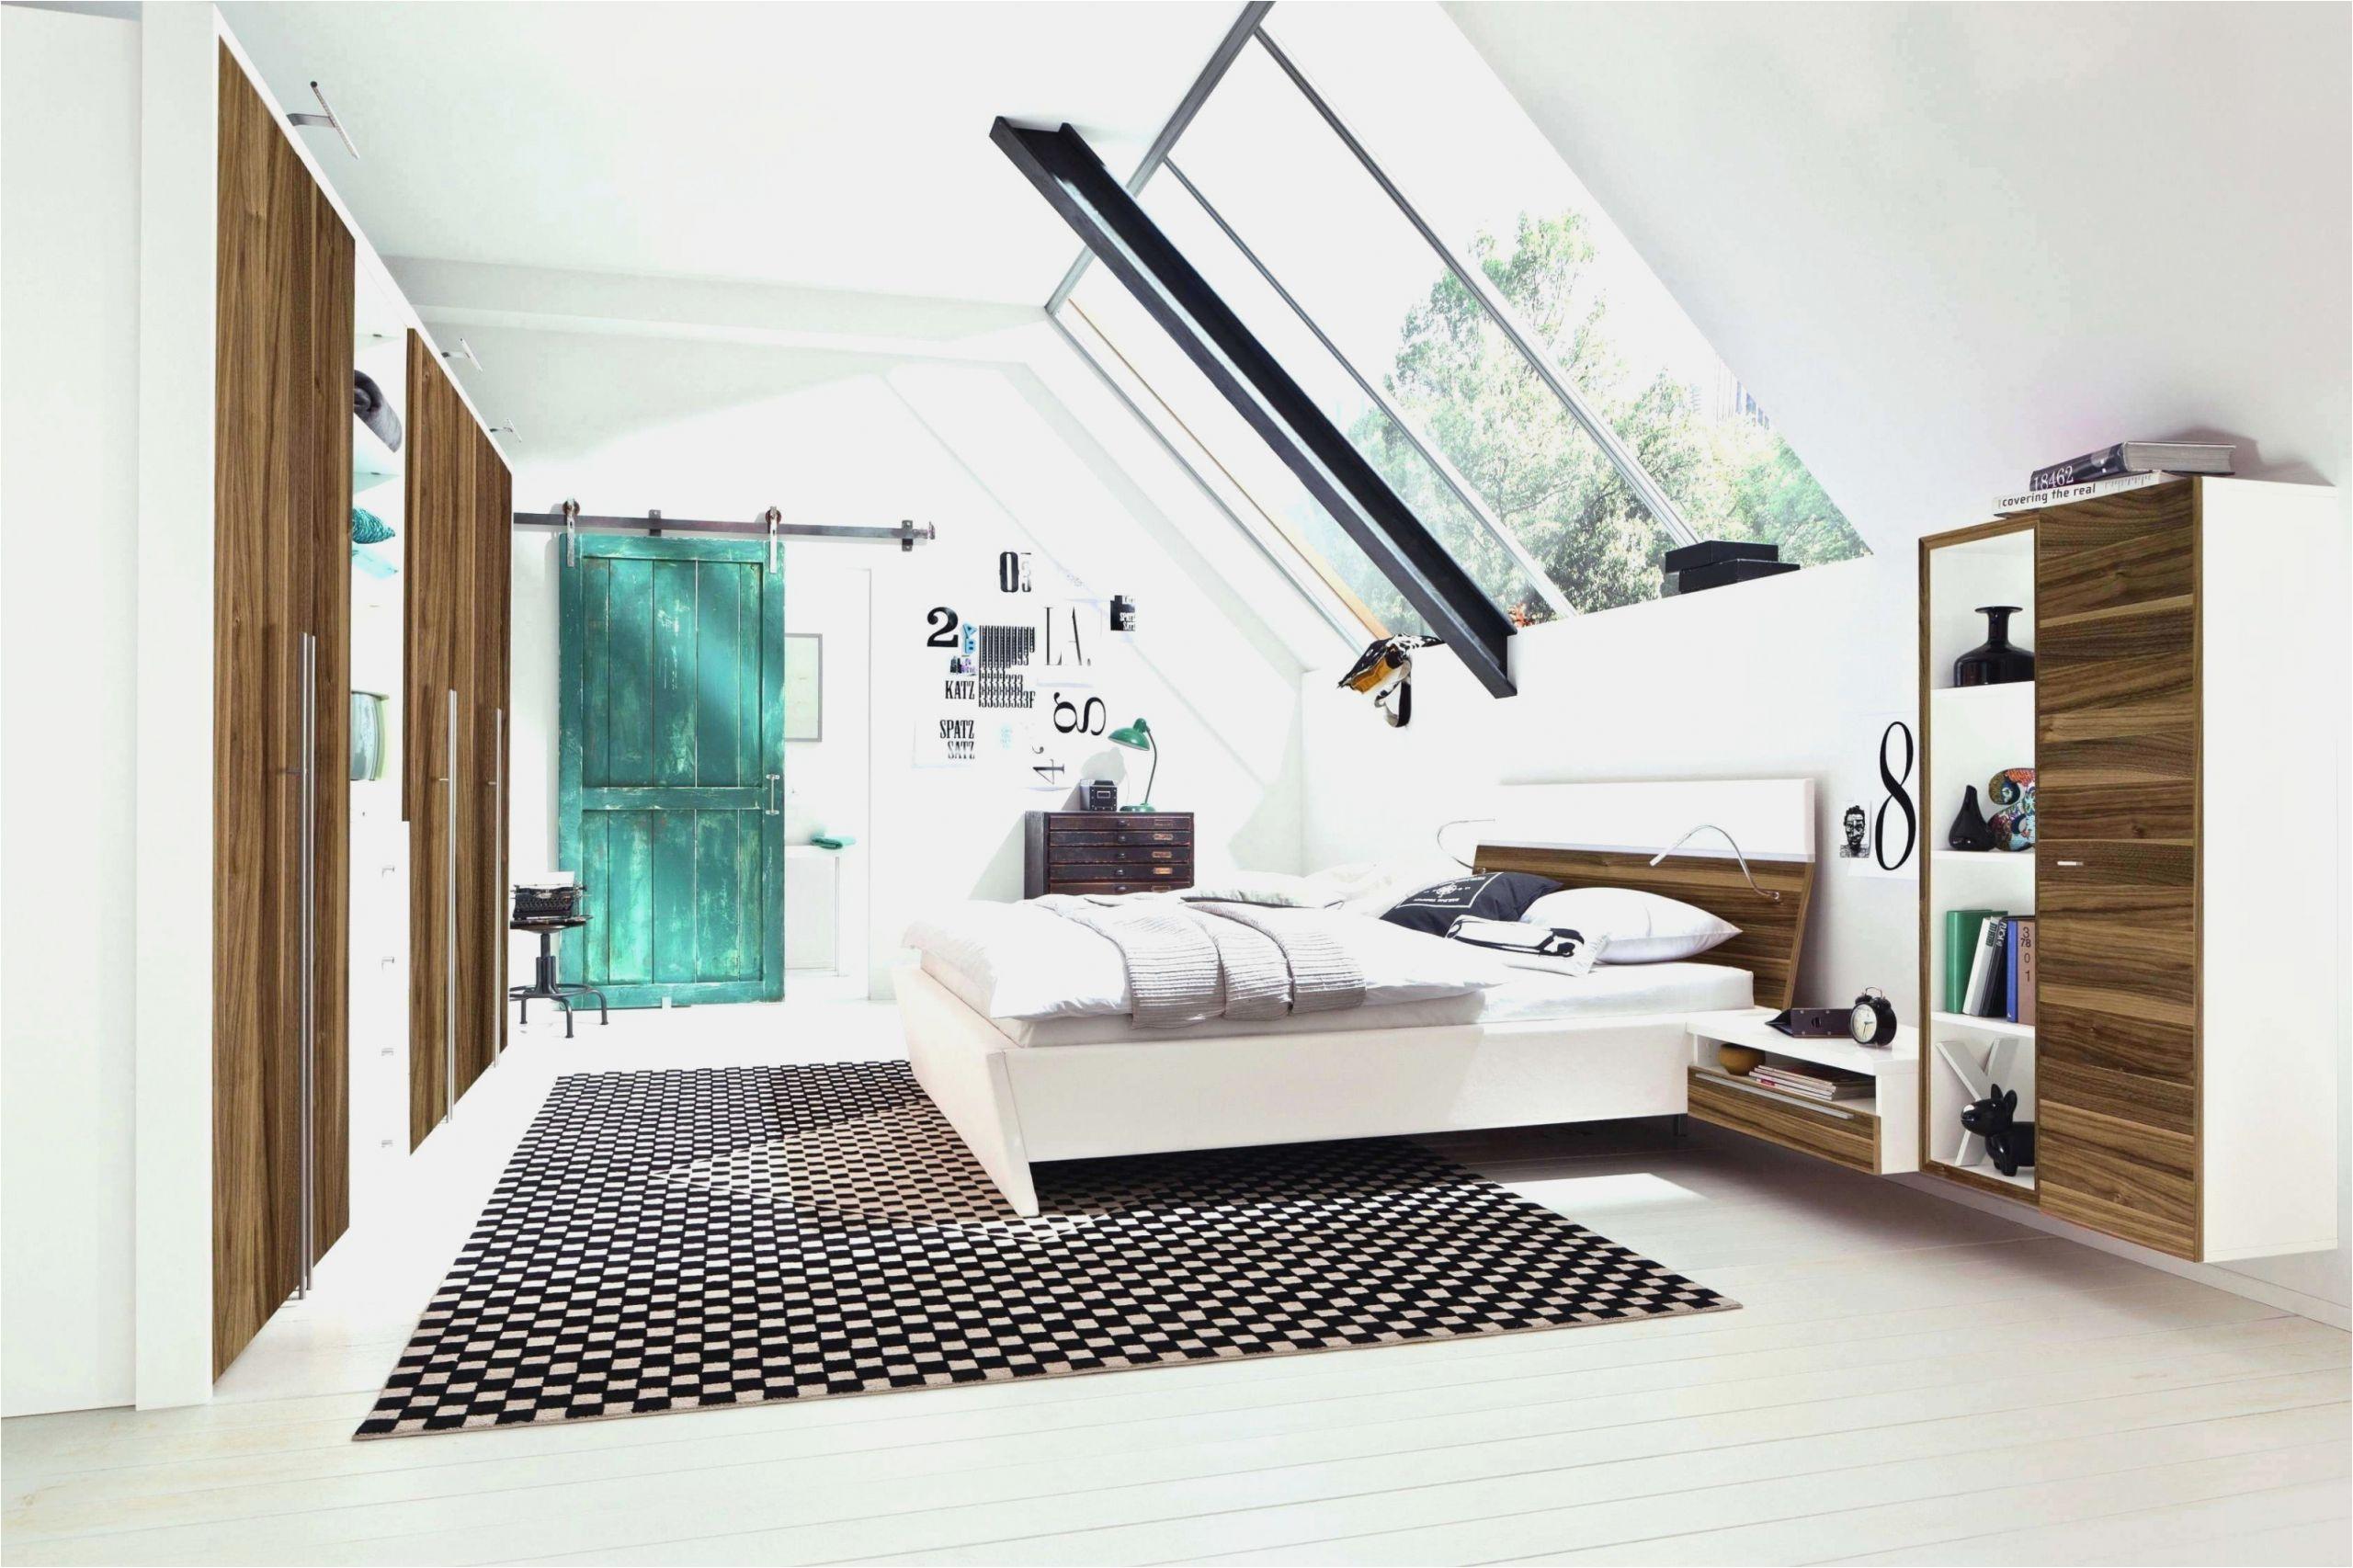 bambus badezimmer elegant schlafzimmer mit bad temobardz home blog of bambus badezimmer scaled